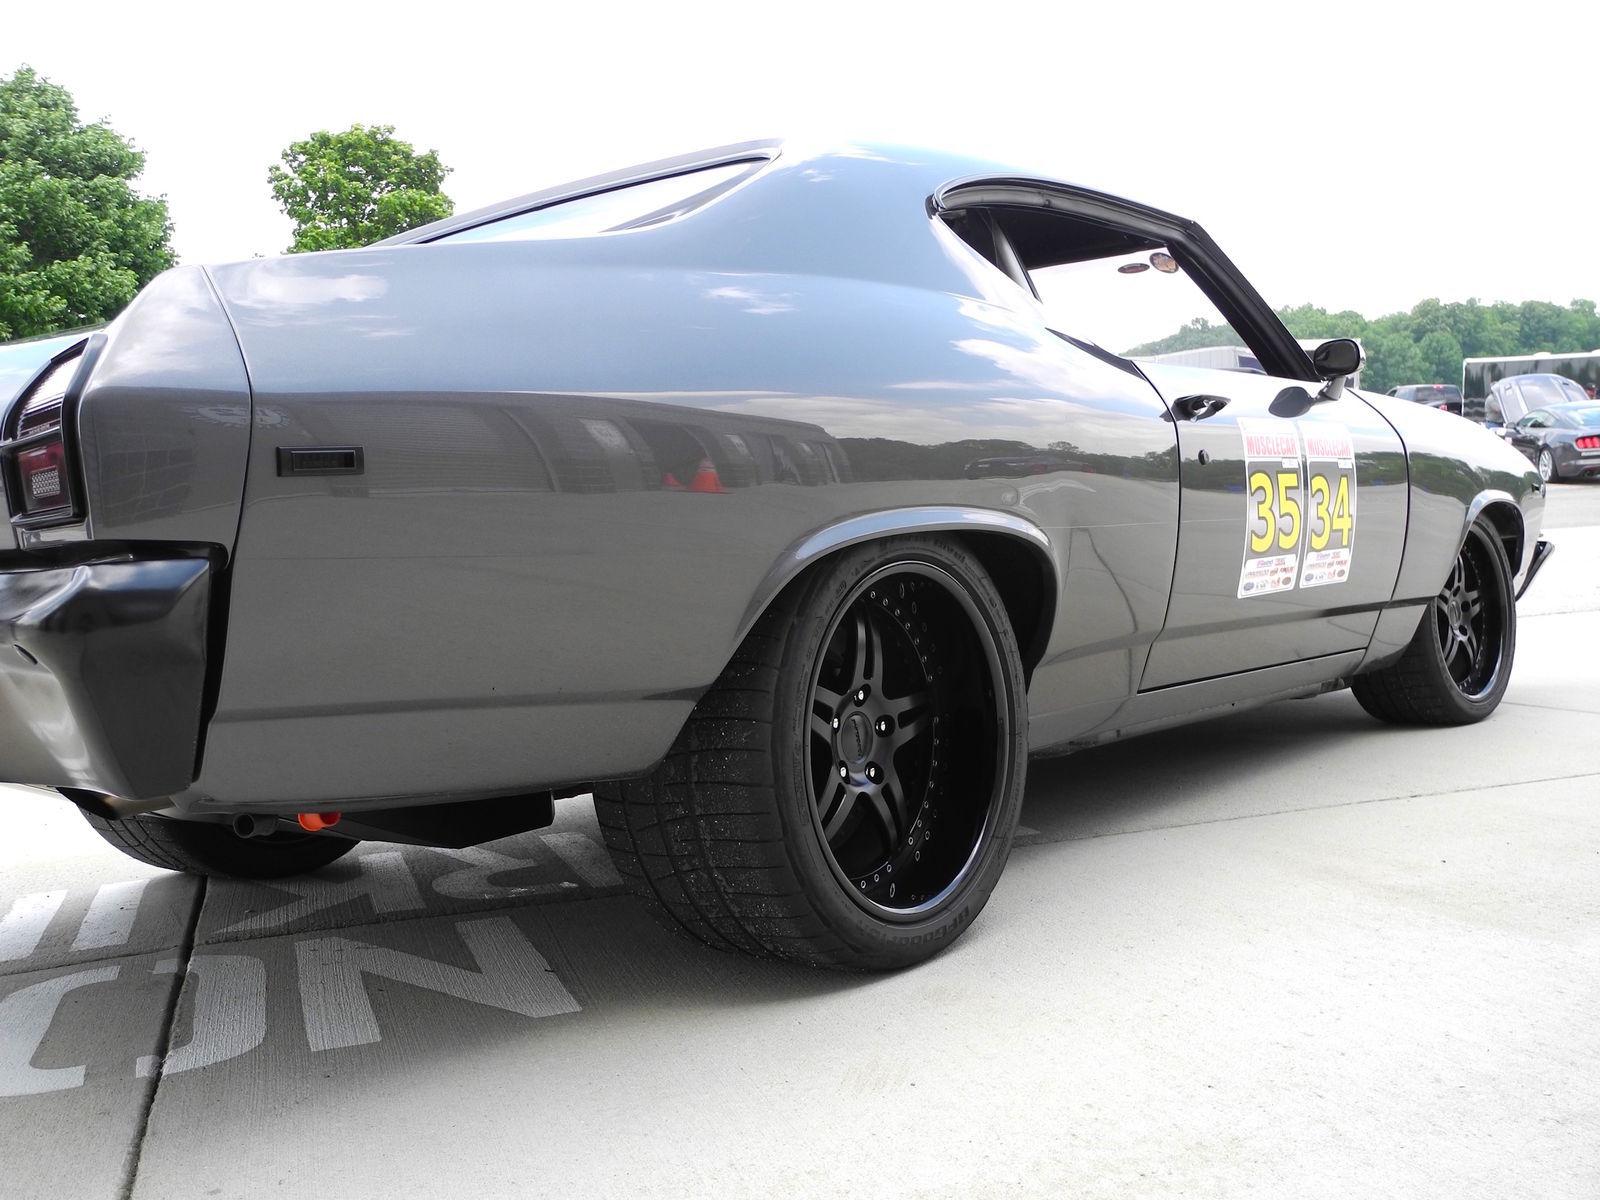 1969 Chevrolet Chevelle | Chevelle on Forgeline SP3P Wheels